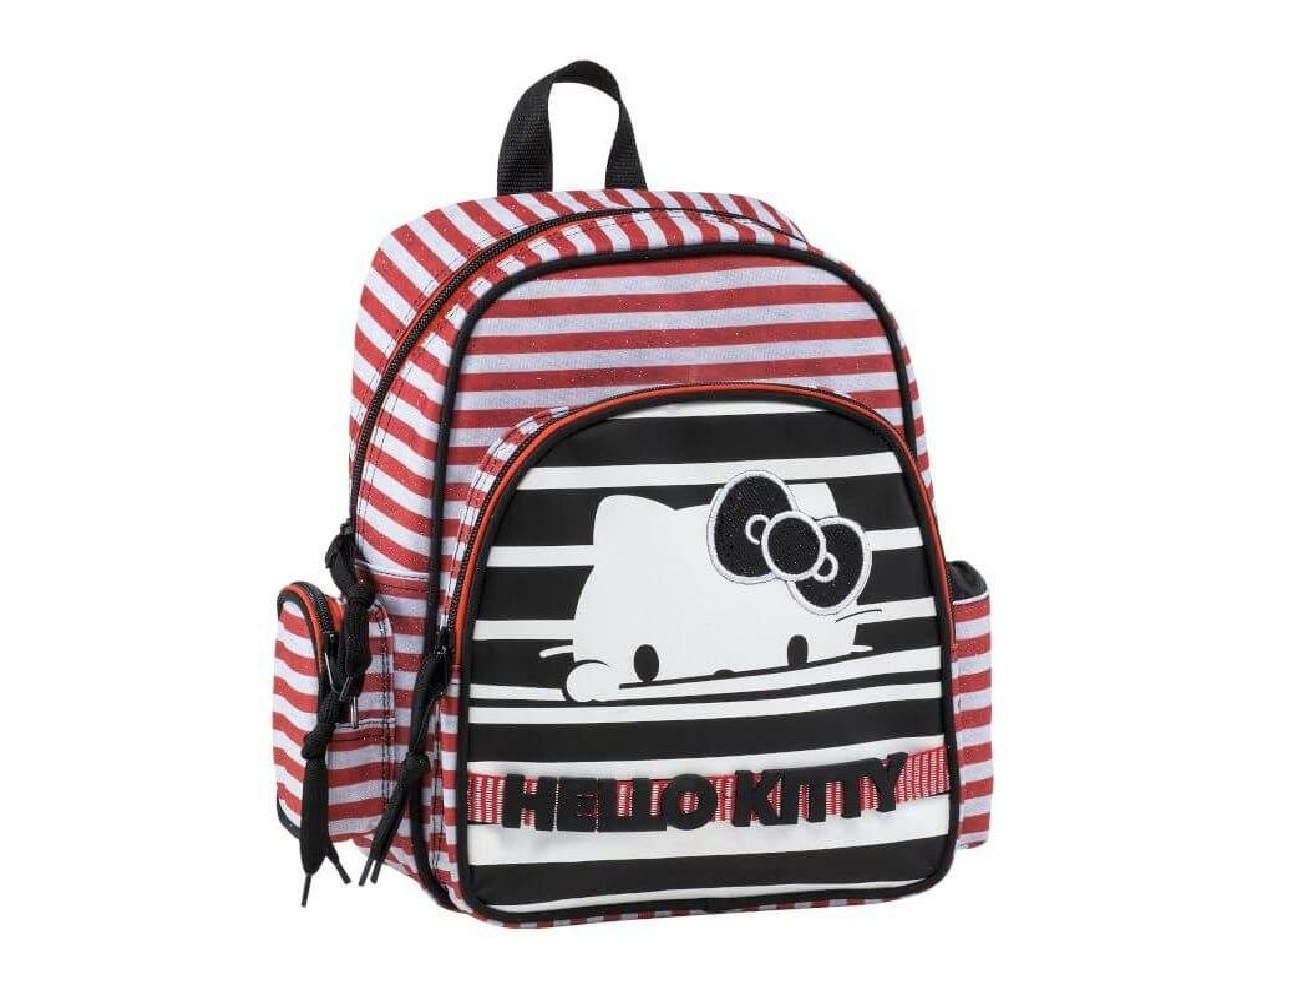 2f1768007e Σακίδιο Νηπιαγωγείου Hidden Stripes - Hello Kitty - 188292 - Lexicon ...